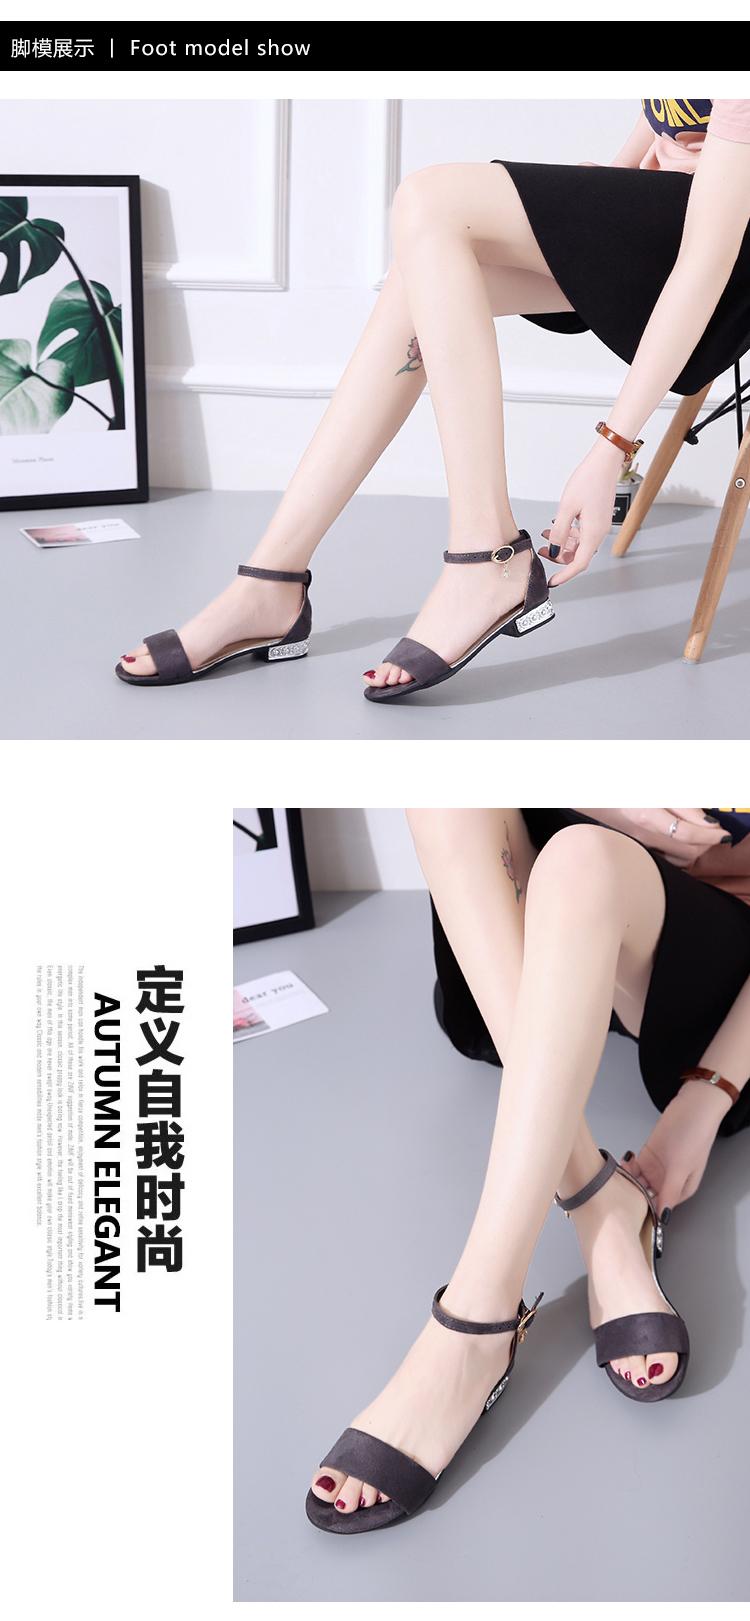 XCZJ Korean Style 2018 Summer Women Sandals Open Toe Flip Flops Women's Flat Sandle With low Women Shoes Gladiator student Shoes 15